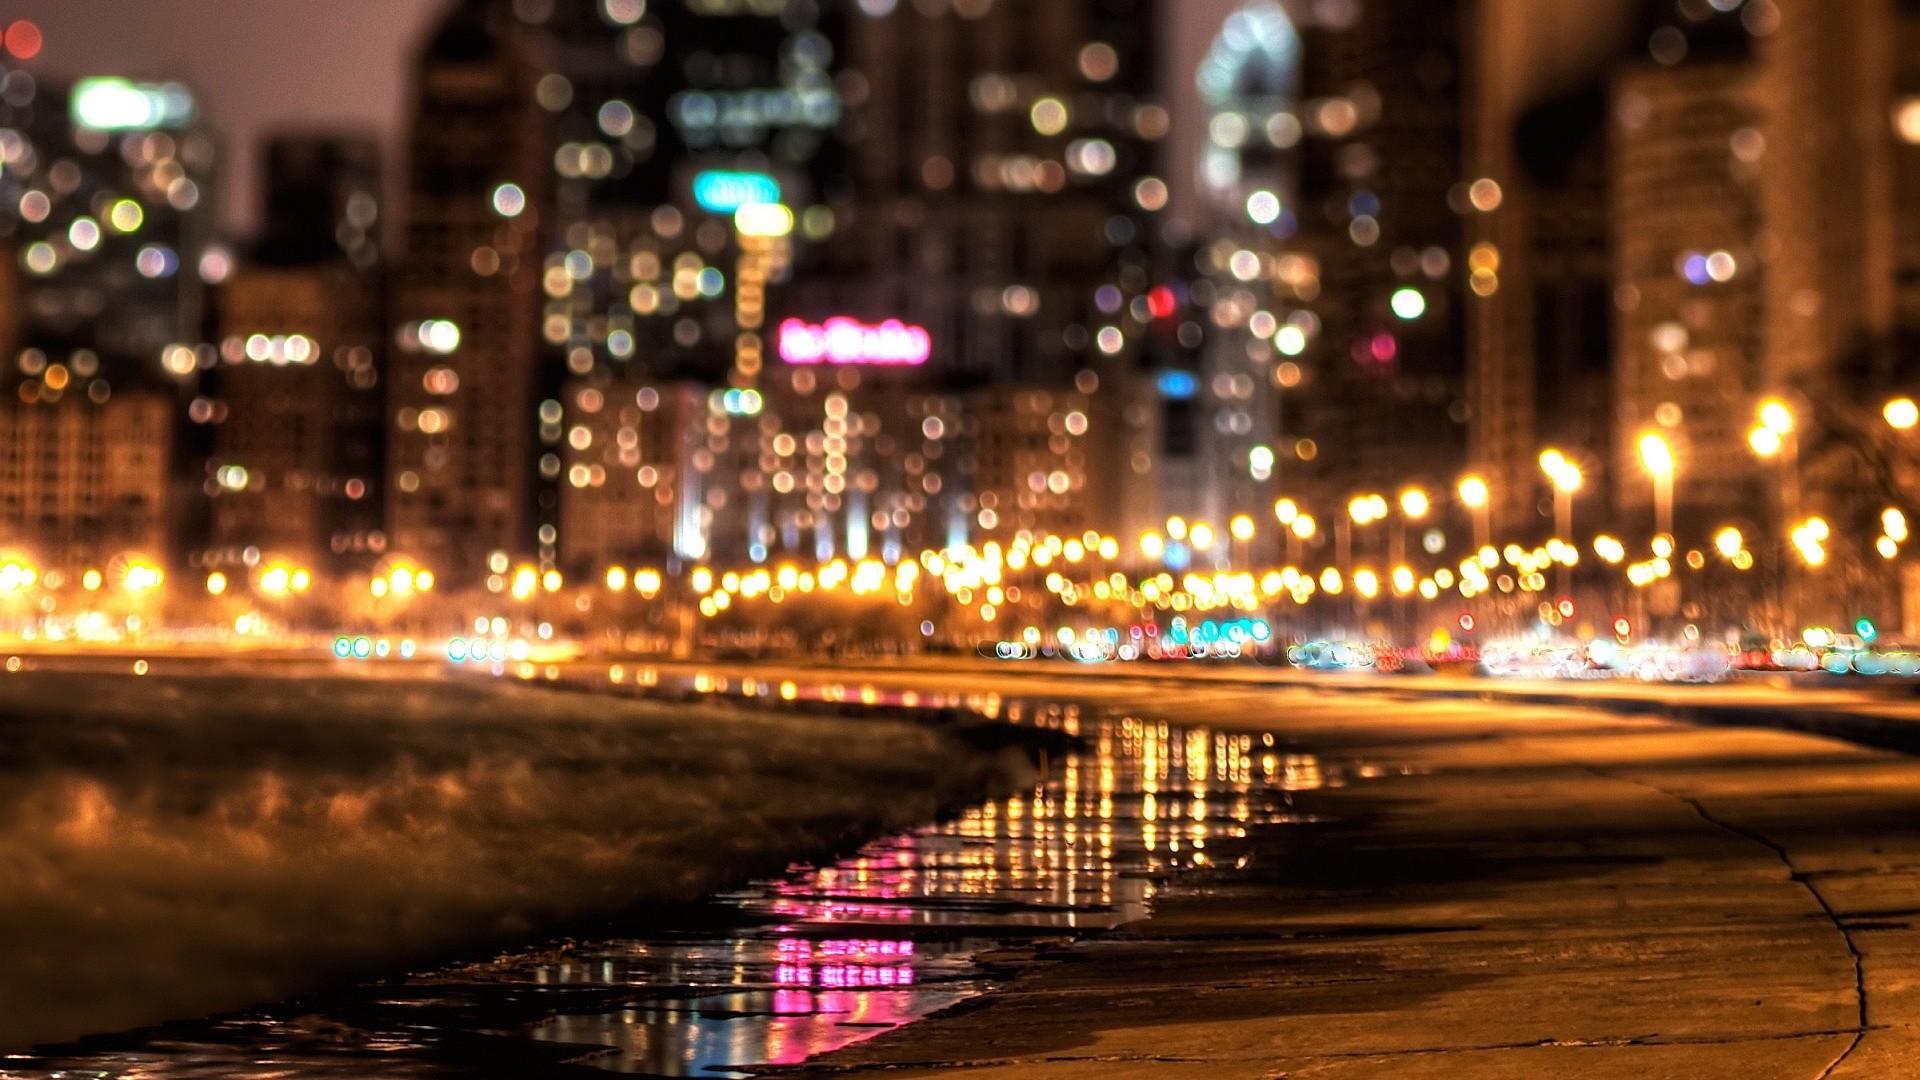 City Lights Wallpaper – Mytwiink.com